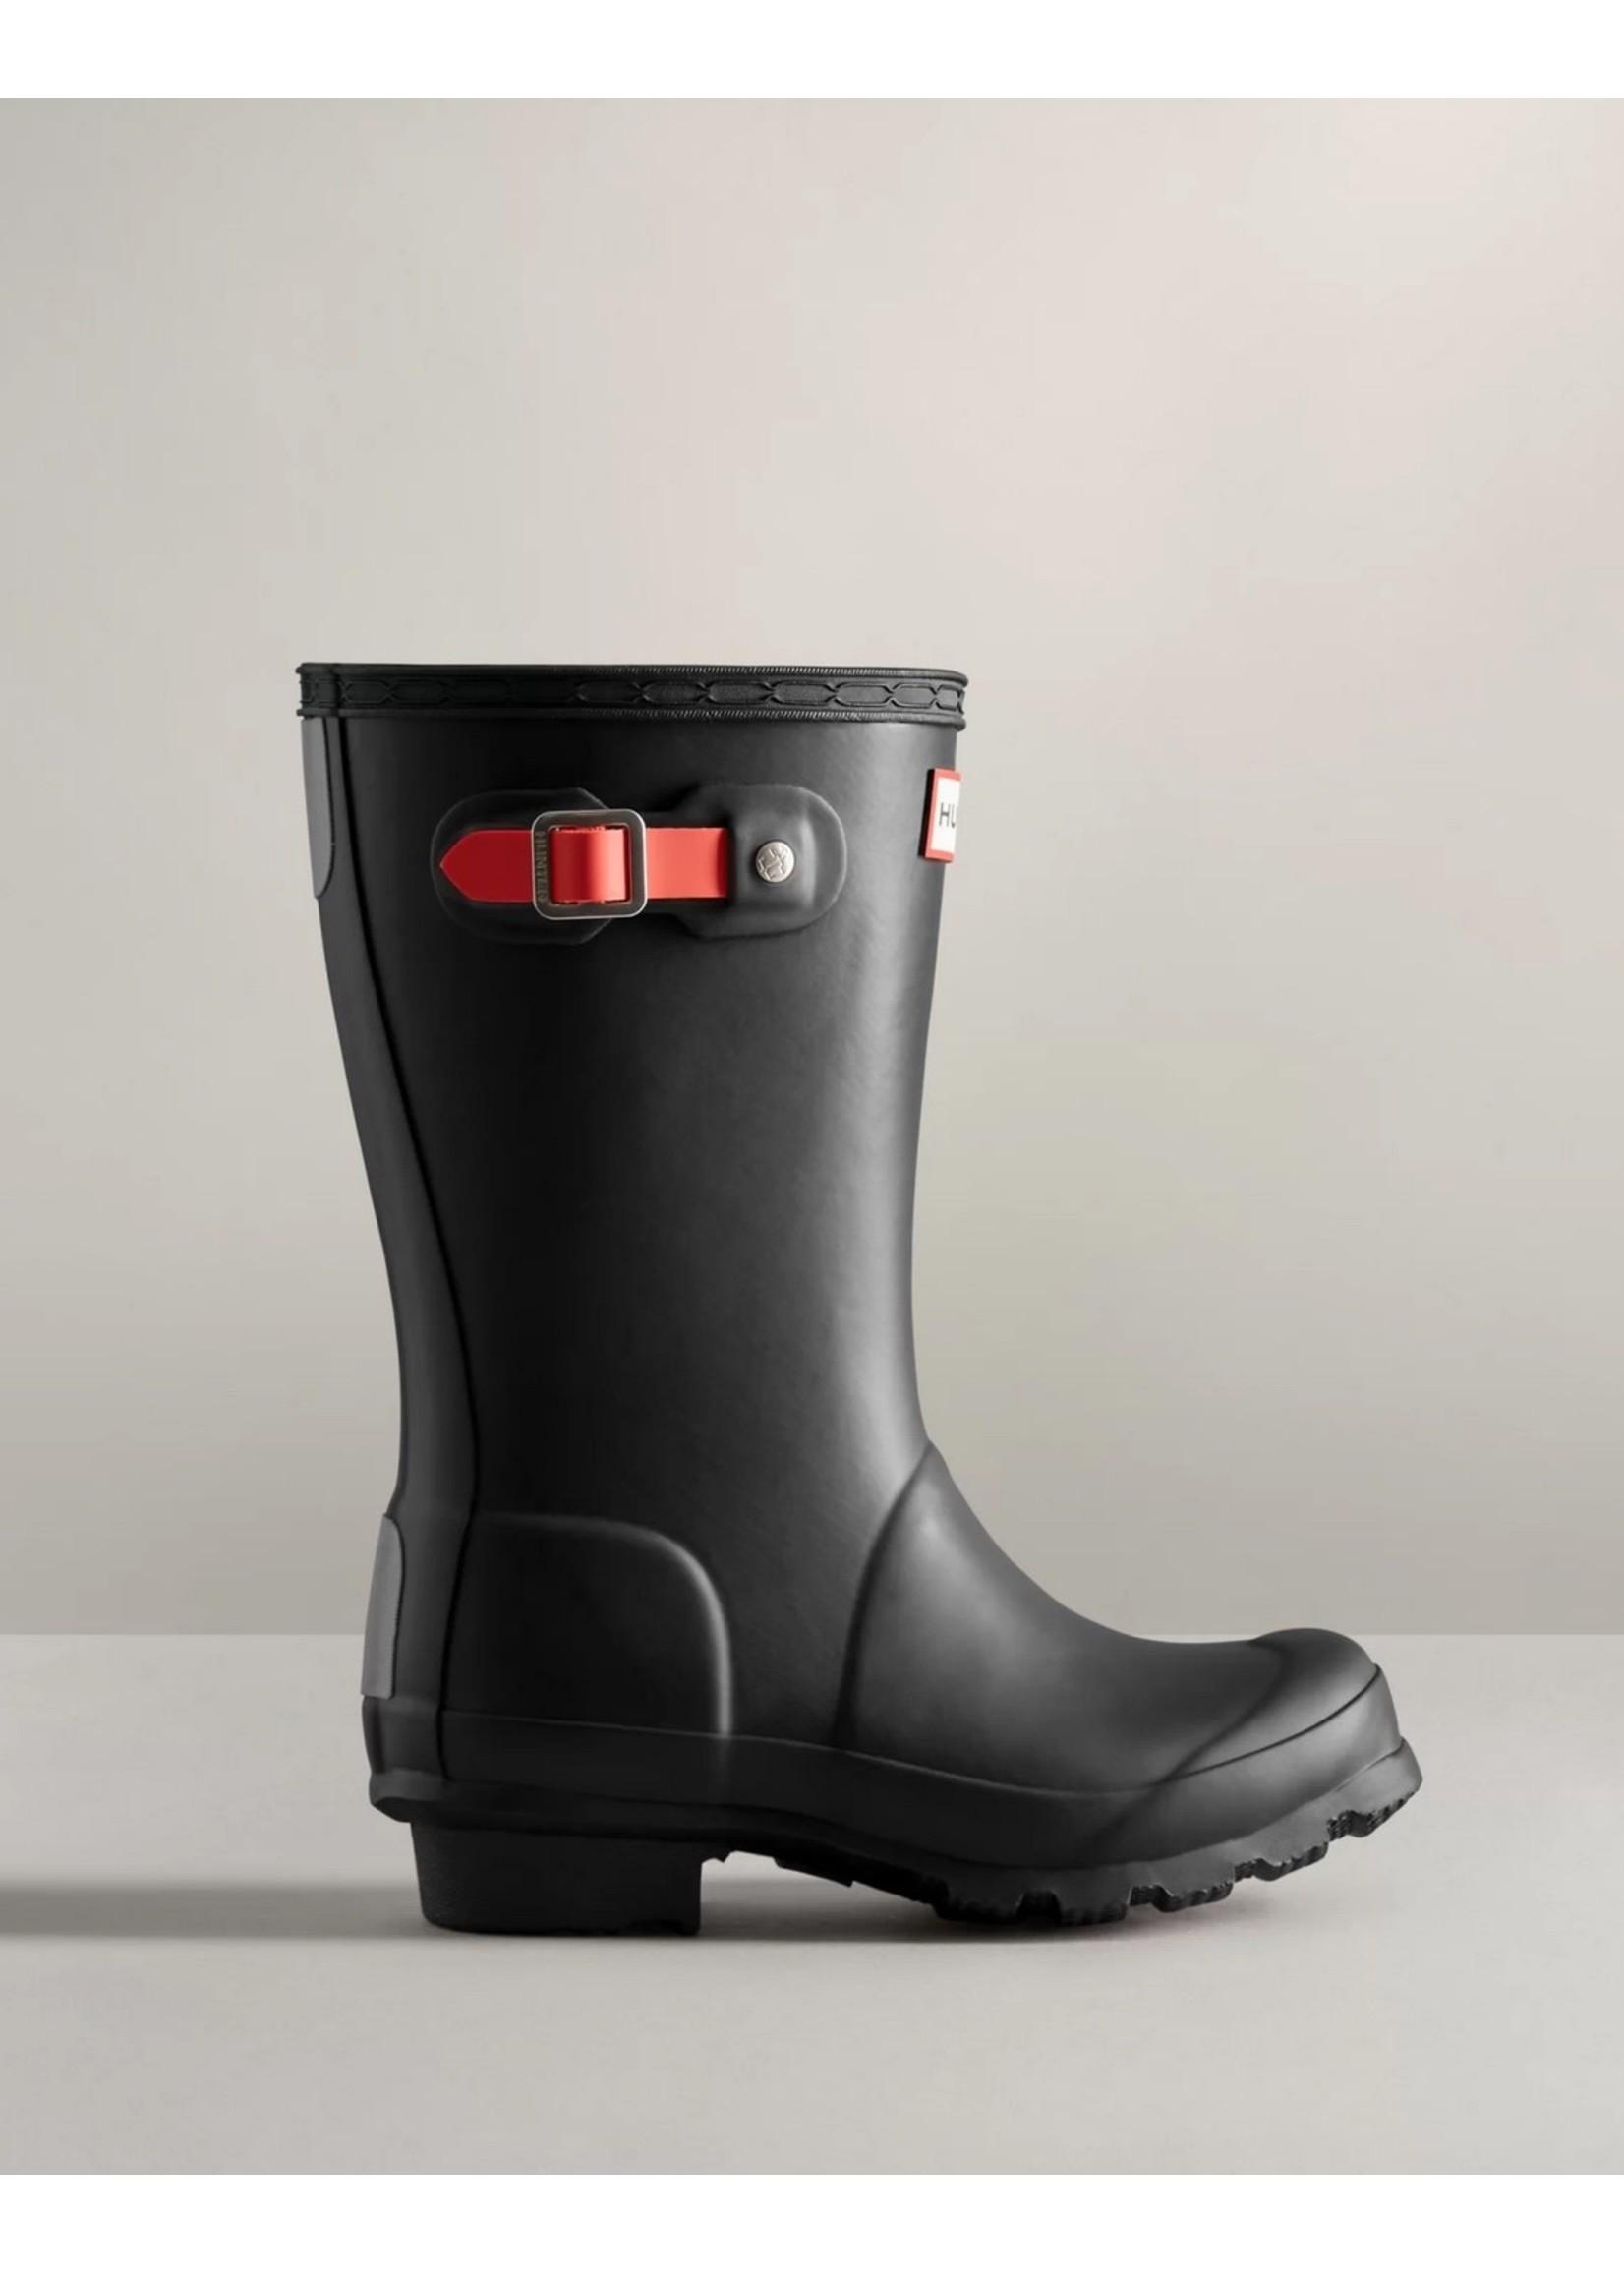 Hunter Boots Hunter Boots, Big Kids Insulated Rain Boots: Black/Logo Red